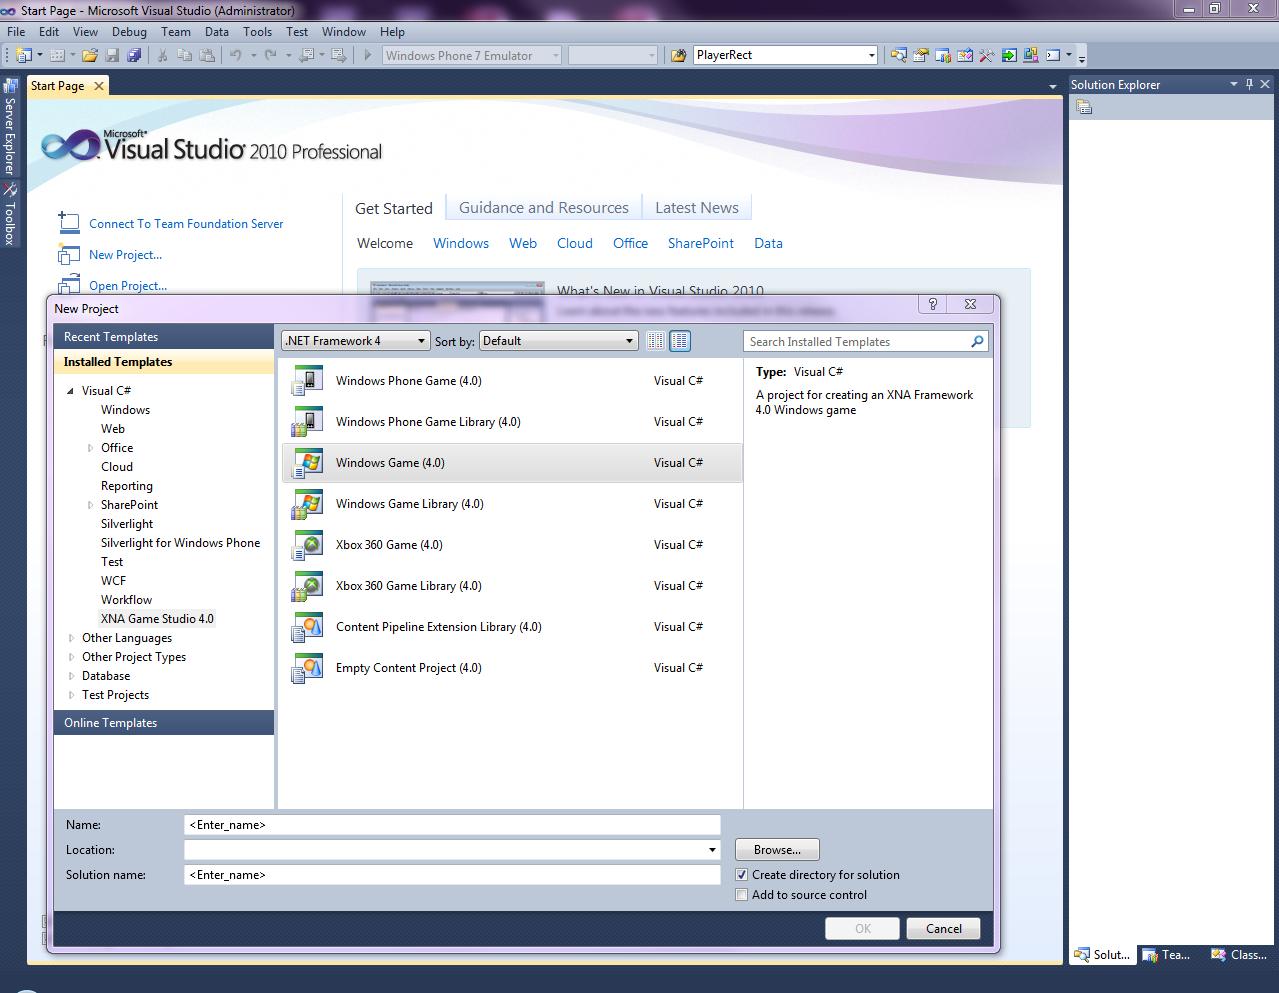 Microsoft xna game studio 4 0 learn programming now pdf download